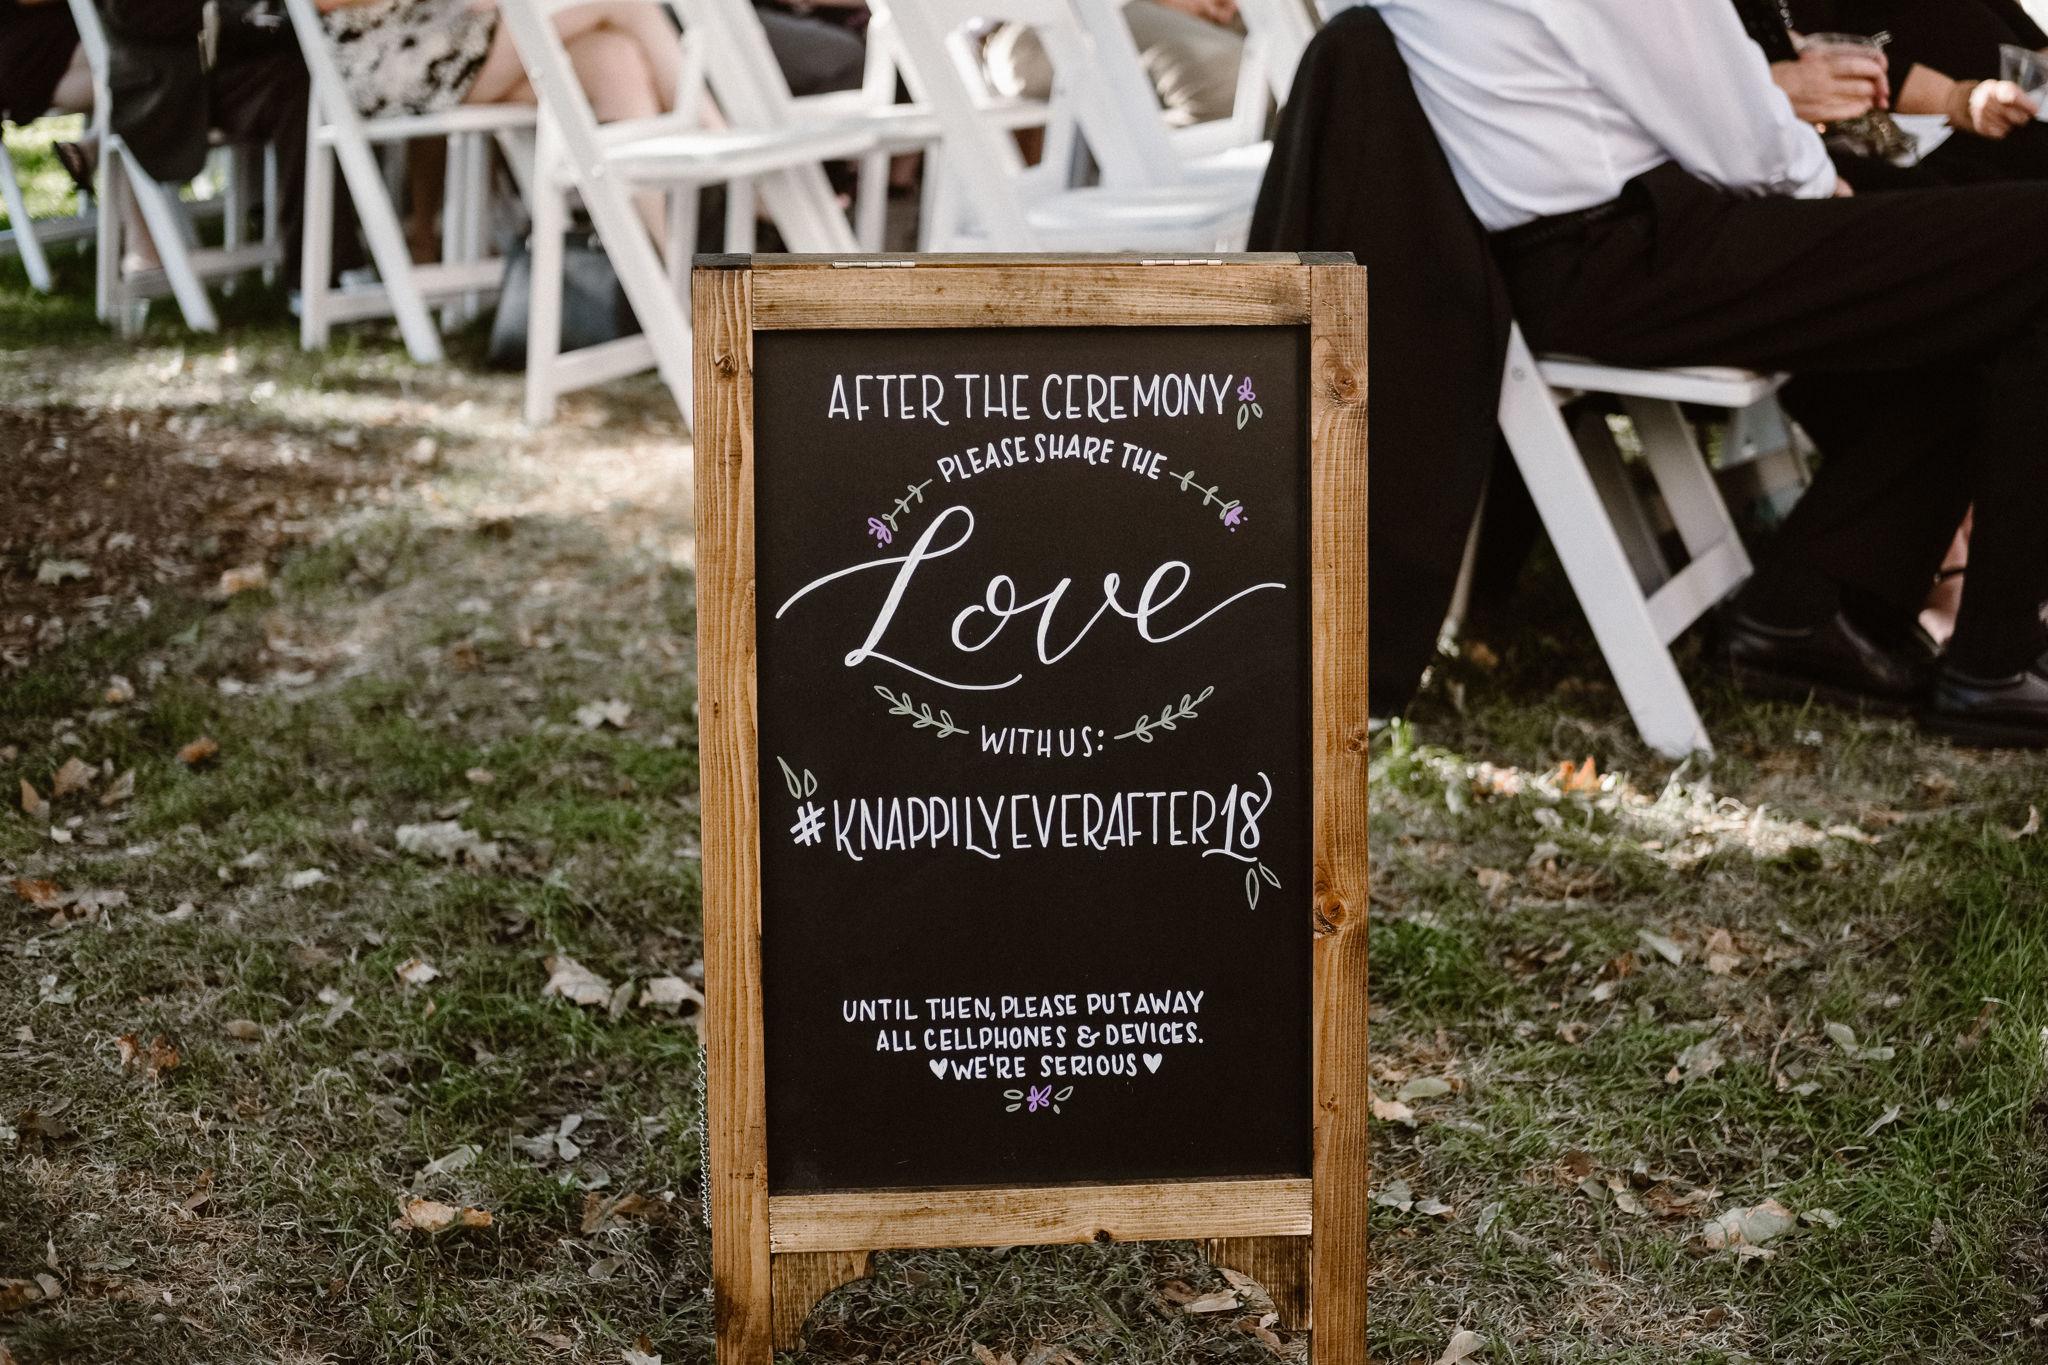 cara-jo-keith-grant-humphreys-mansion-wedding-7-30.jpg